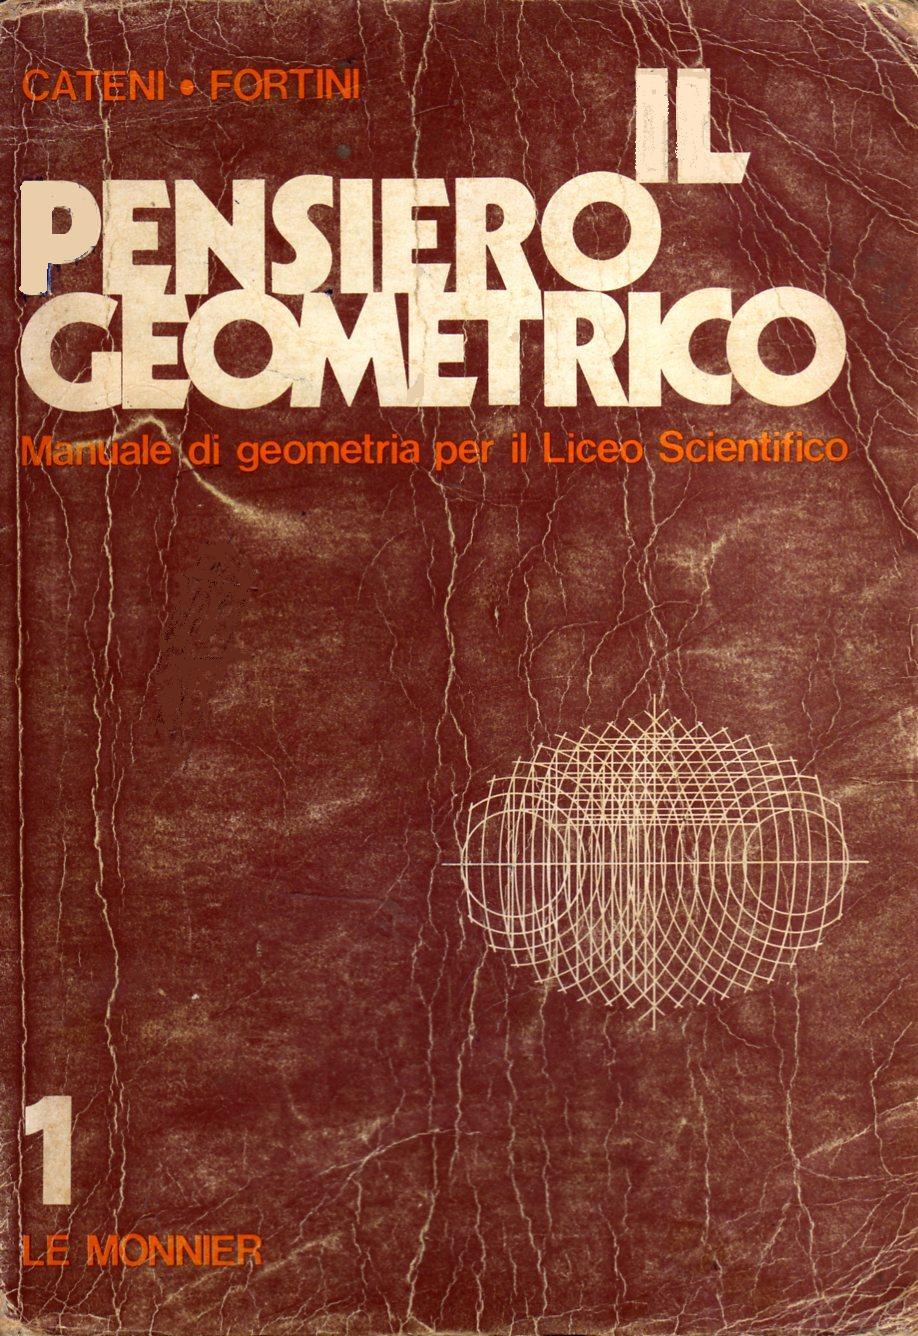 Il pensiero geometrico vol. 1